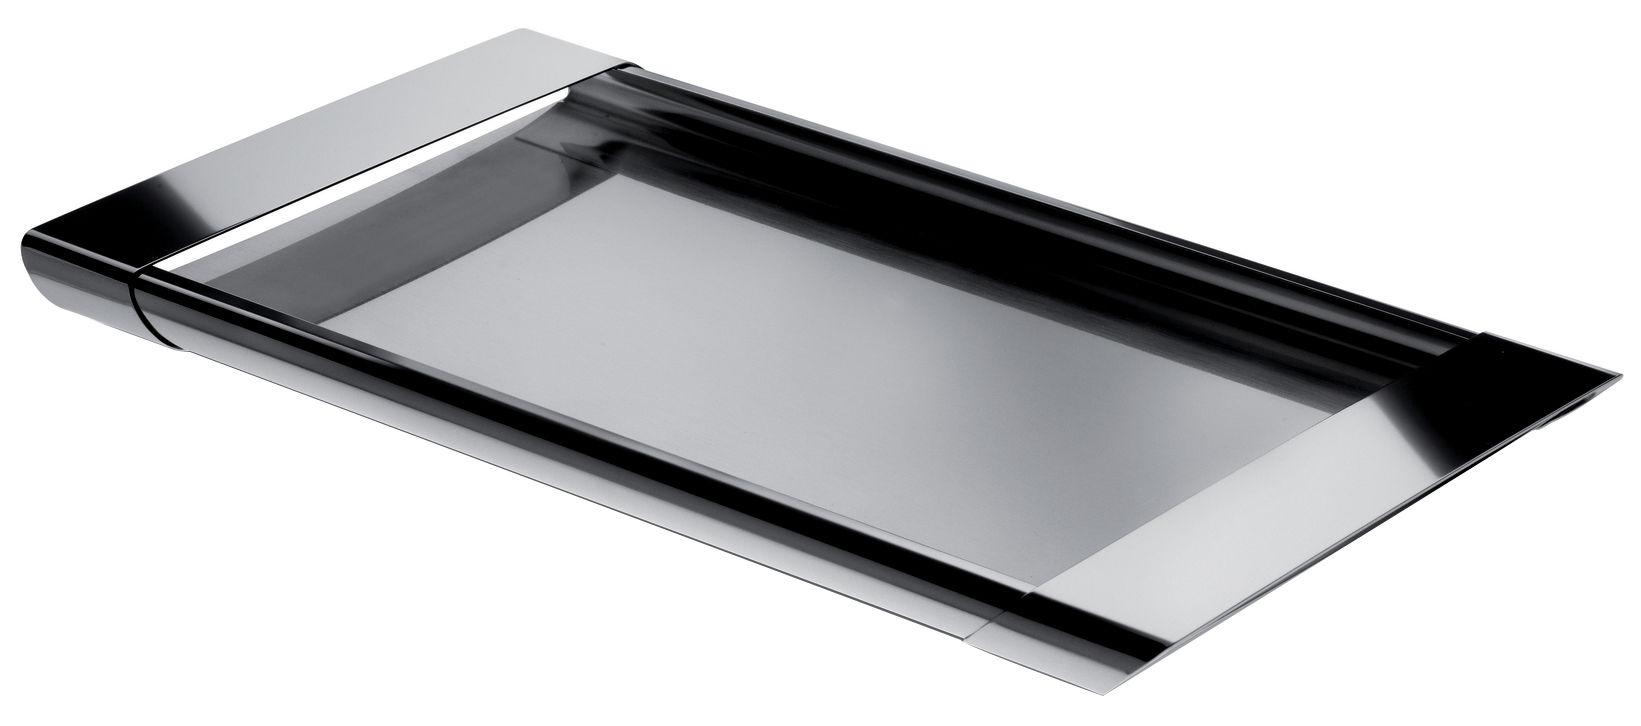 Arts de la table - Plateaux - Plateau Tiffany / 46 x 26 cm - Alessi - Acier - Acier inoxydable